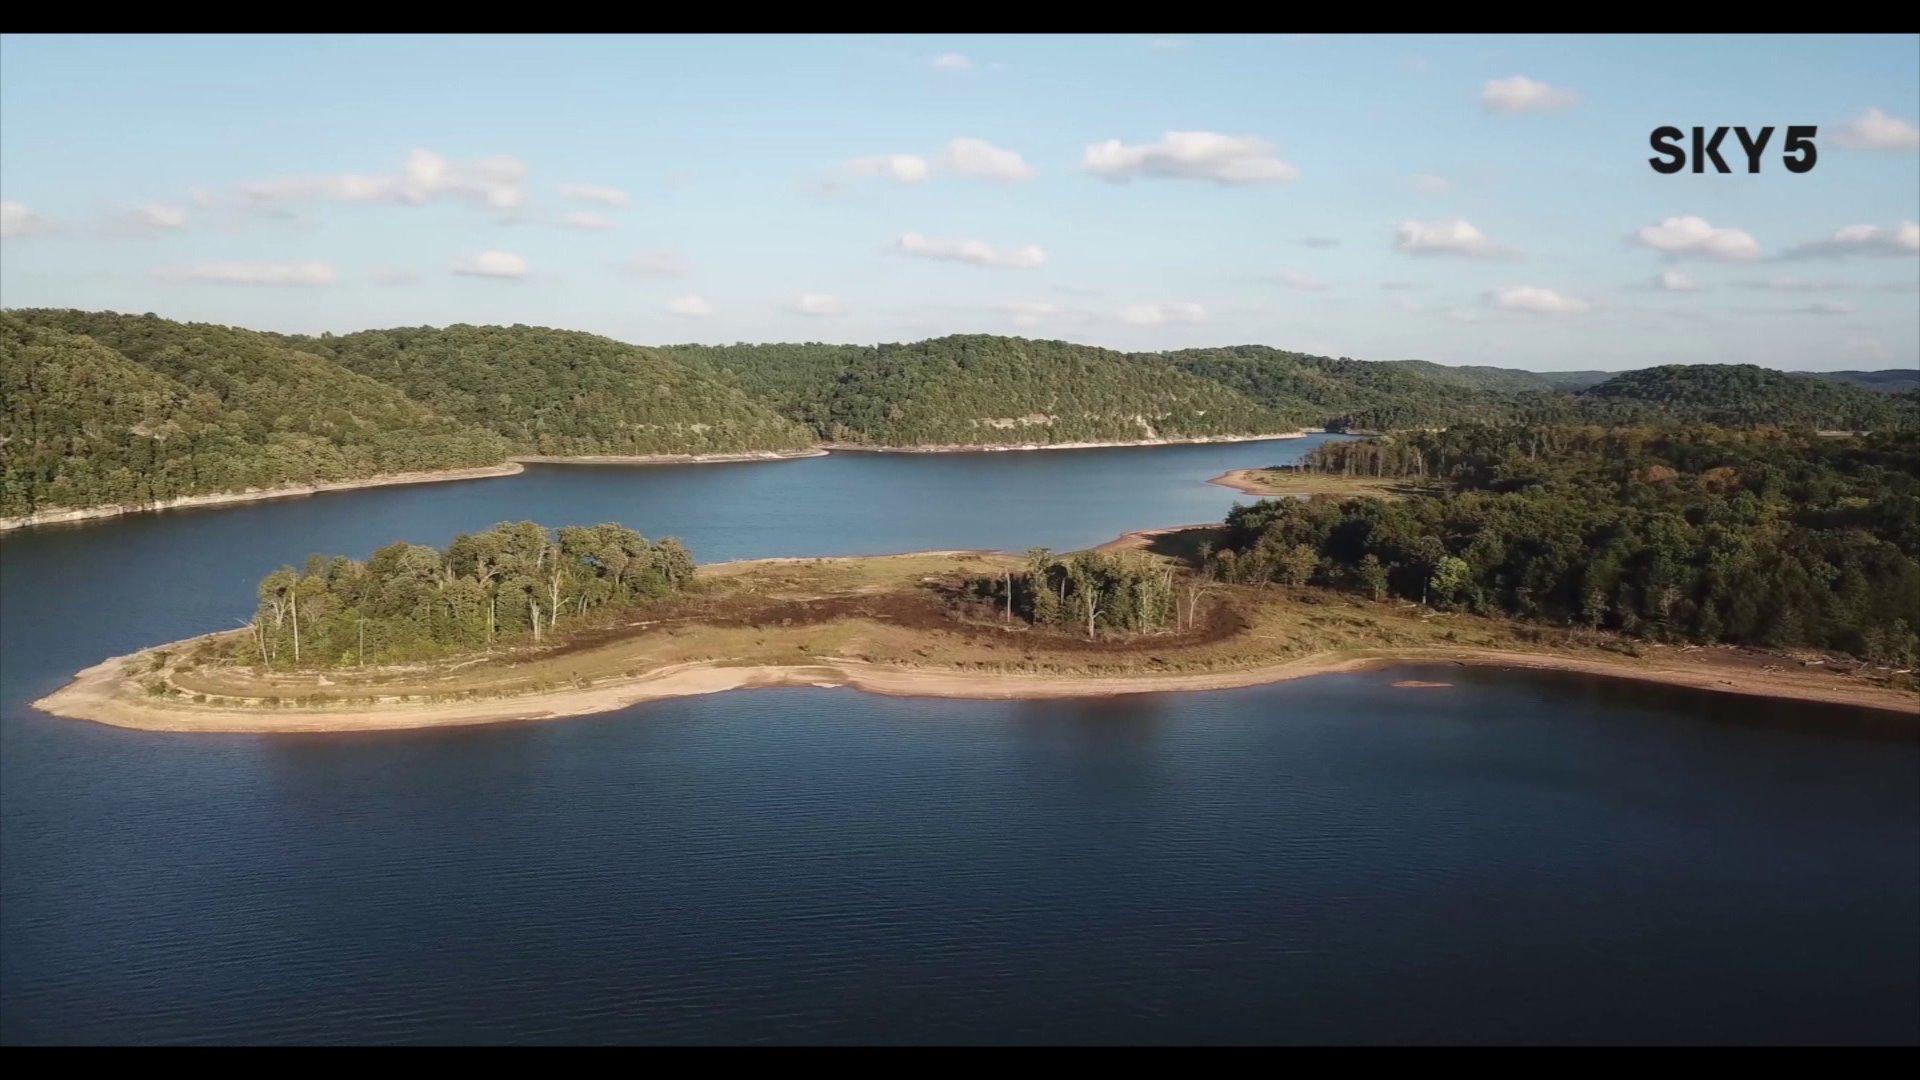 Corps Of Engineers Reopen Swim Beaches On Beaver Lake thumbnail